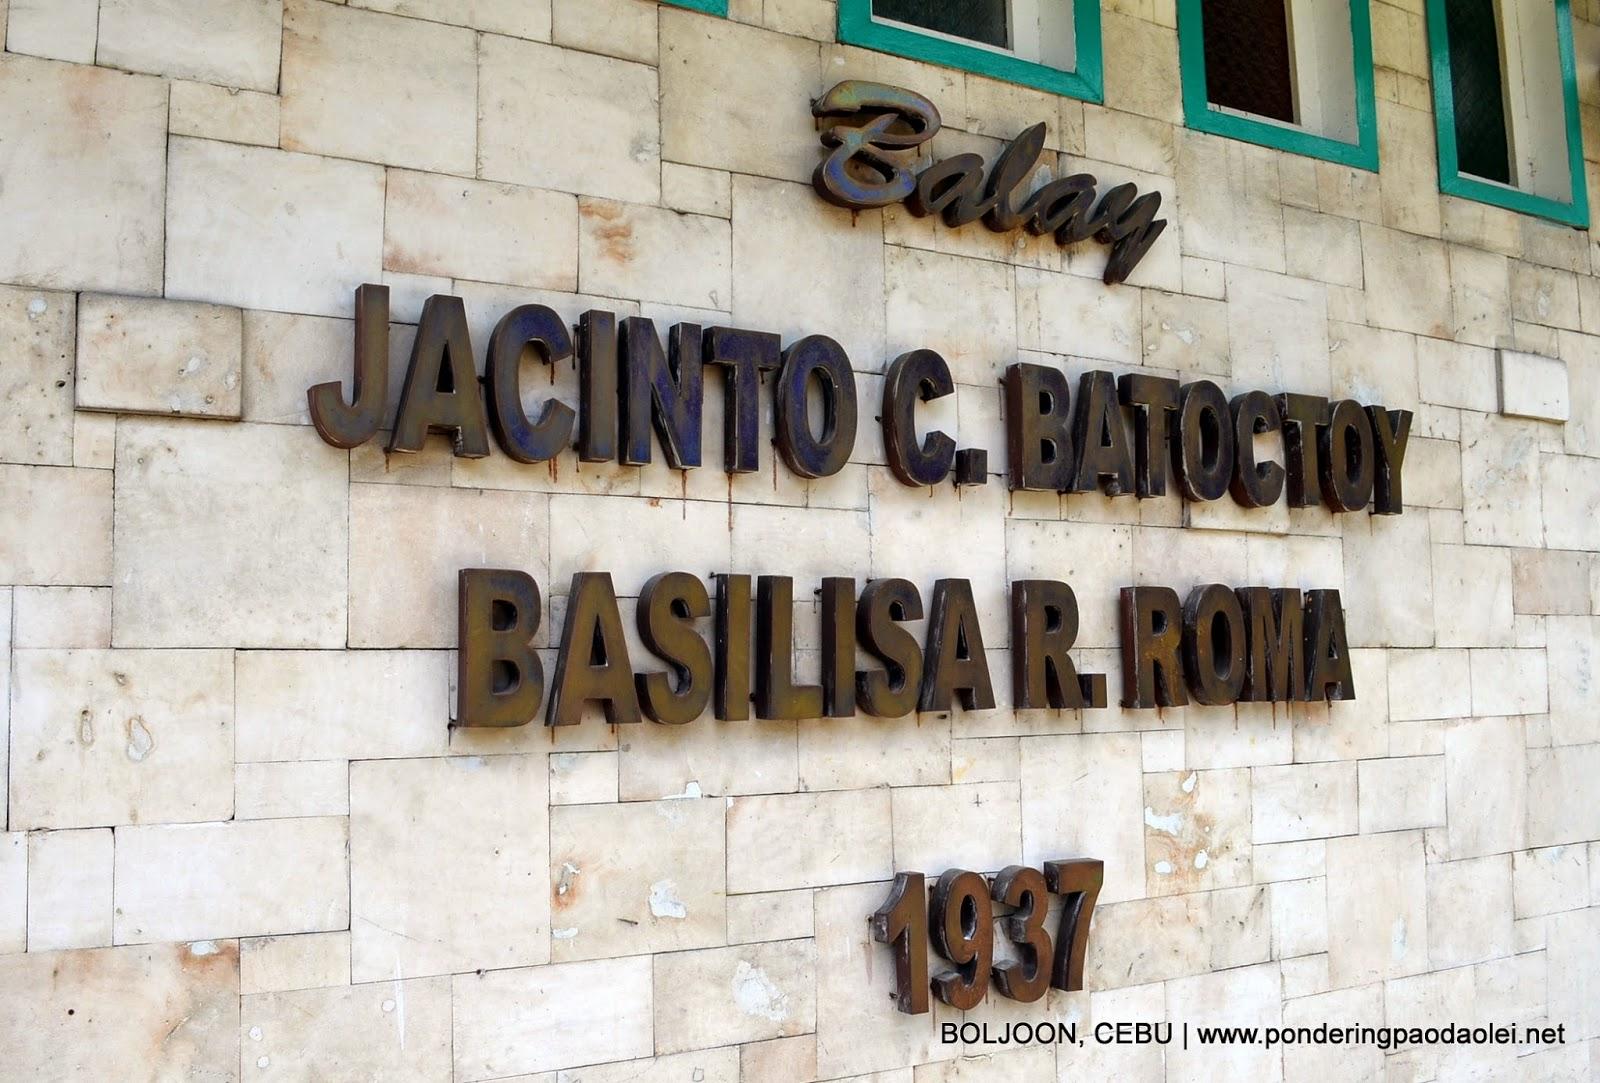 Boljoon's Past Inside This Balay